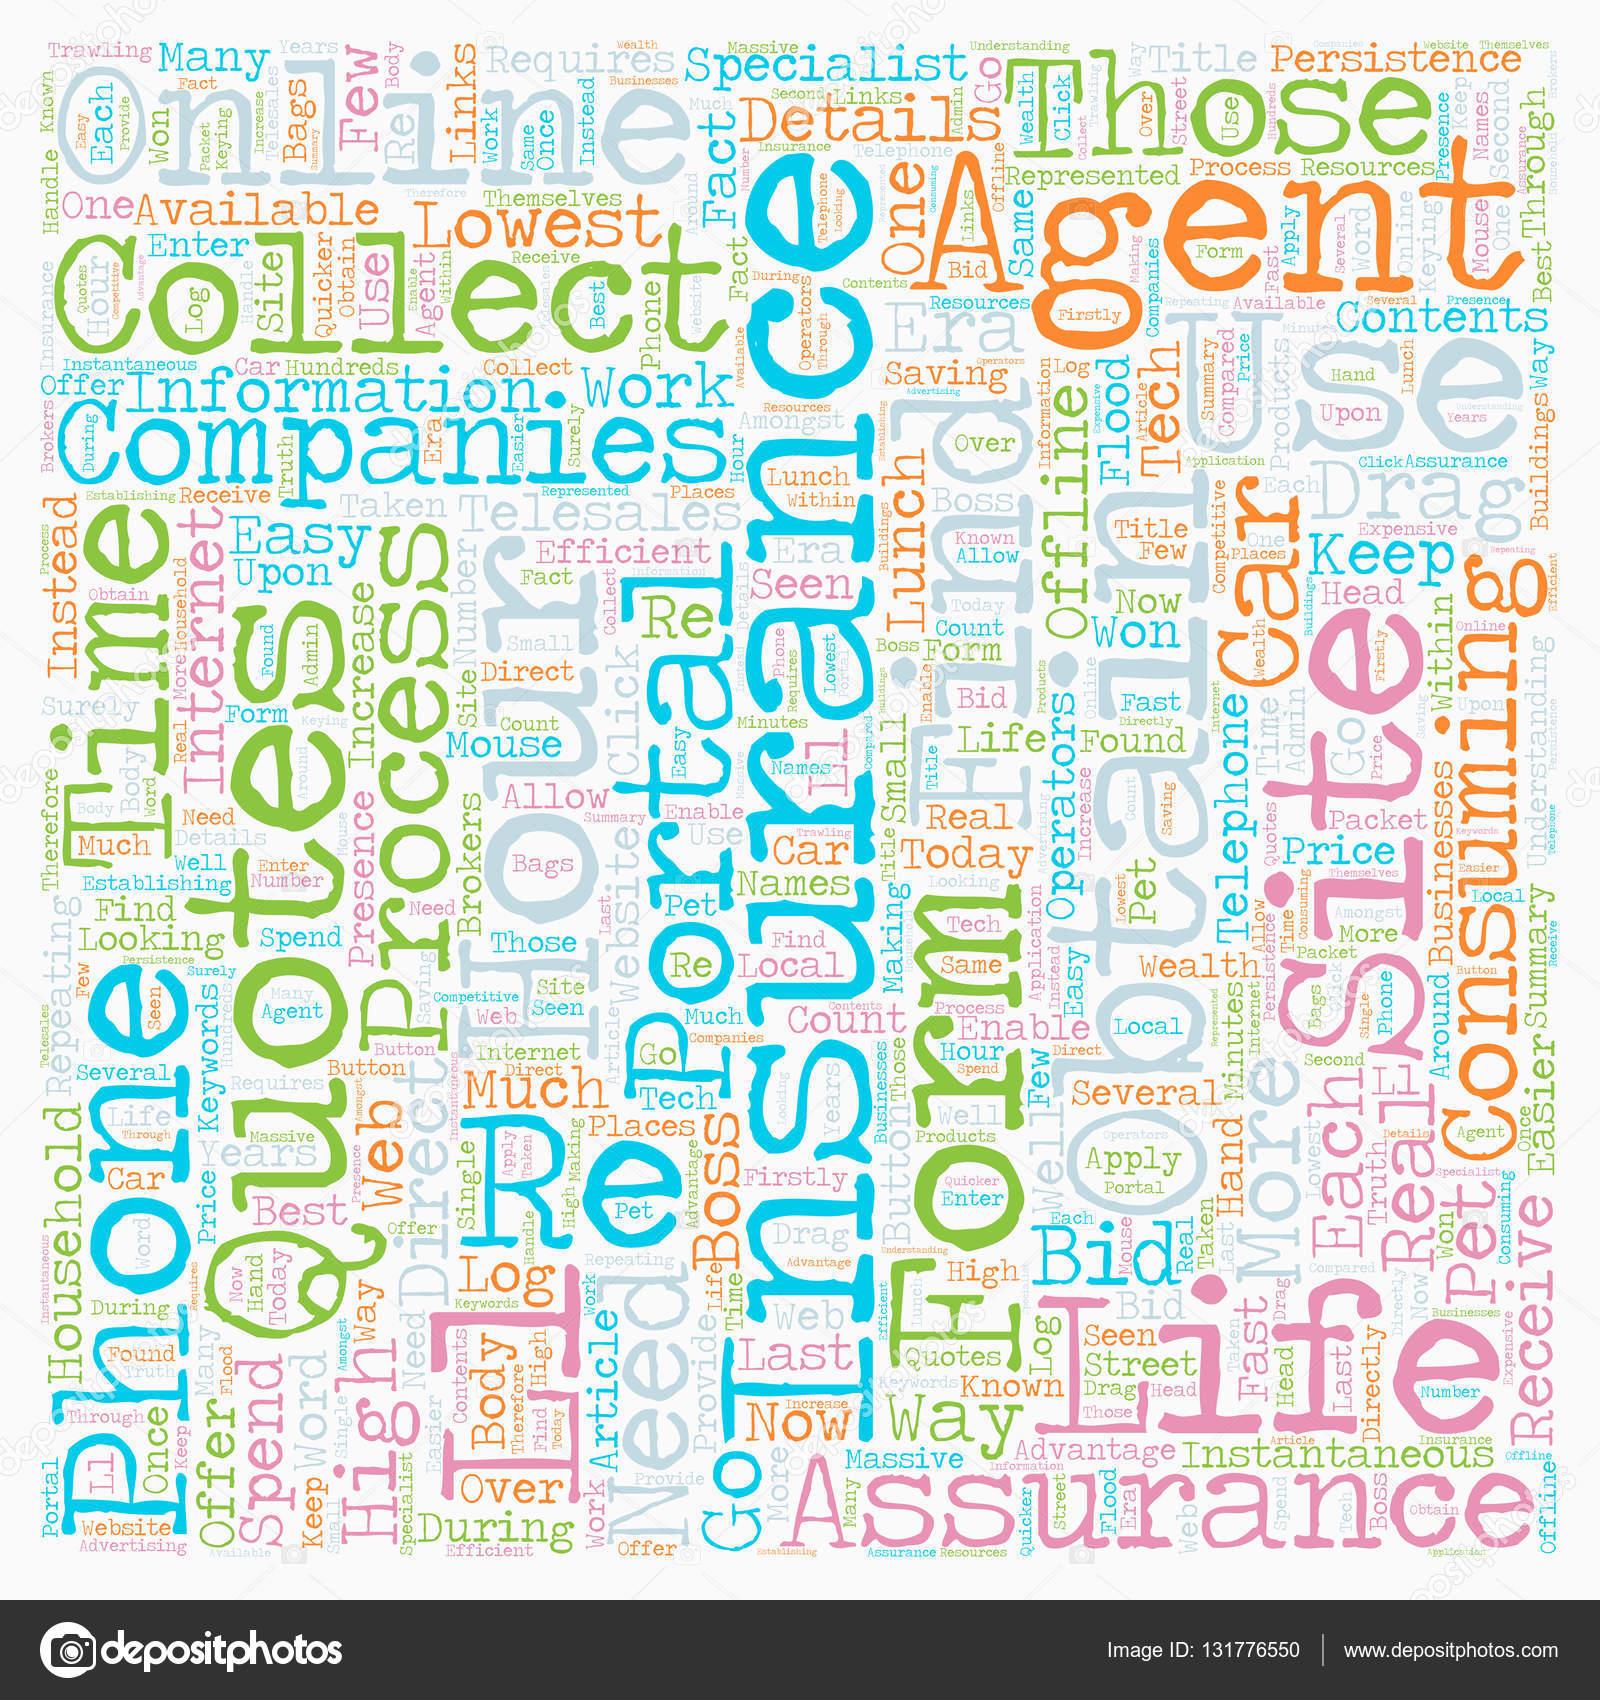 Image of: Instant Online Insurance Quotes Tekst Achtergrond Wordcloud Concept Stockvector Travel Insurance Review Online Insurance Quotes Tekst Achtergrond Wordcloud Concept